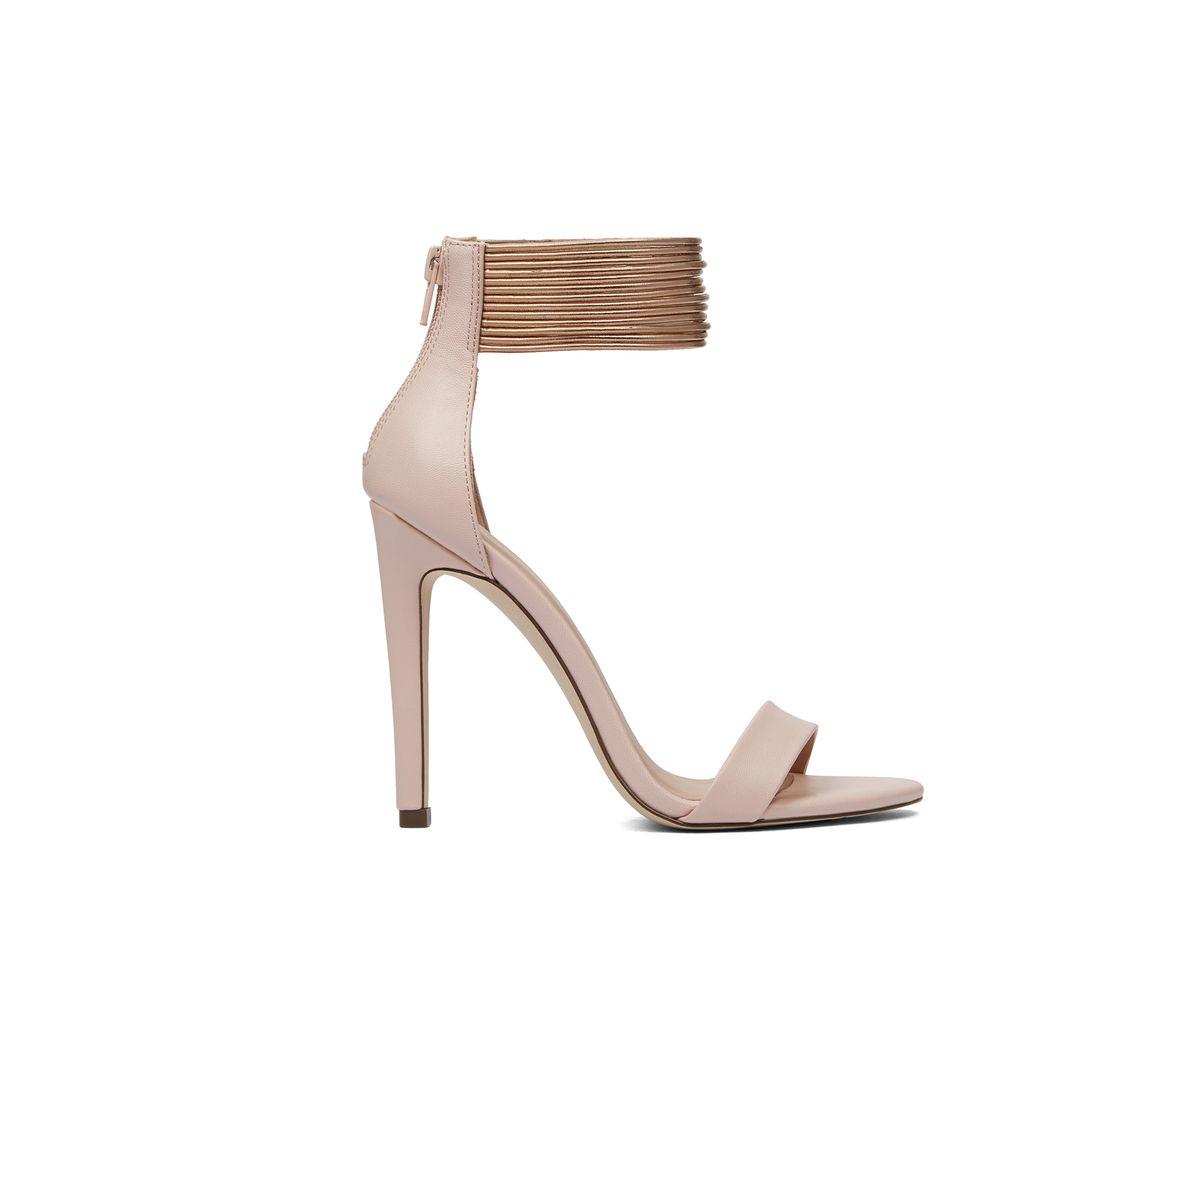 485601c80fa7 Zeta Light Pink Women s High Heels